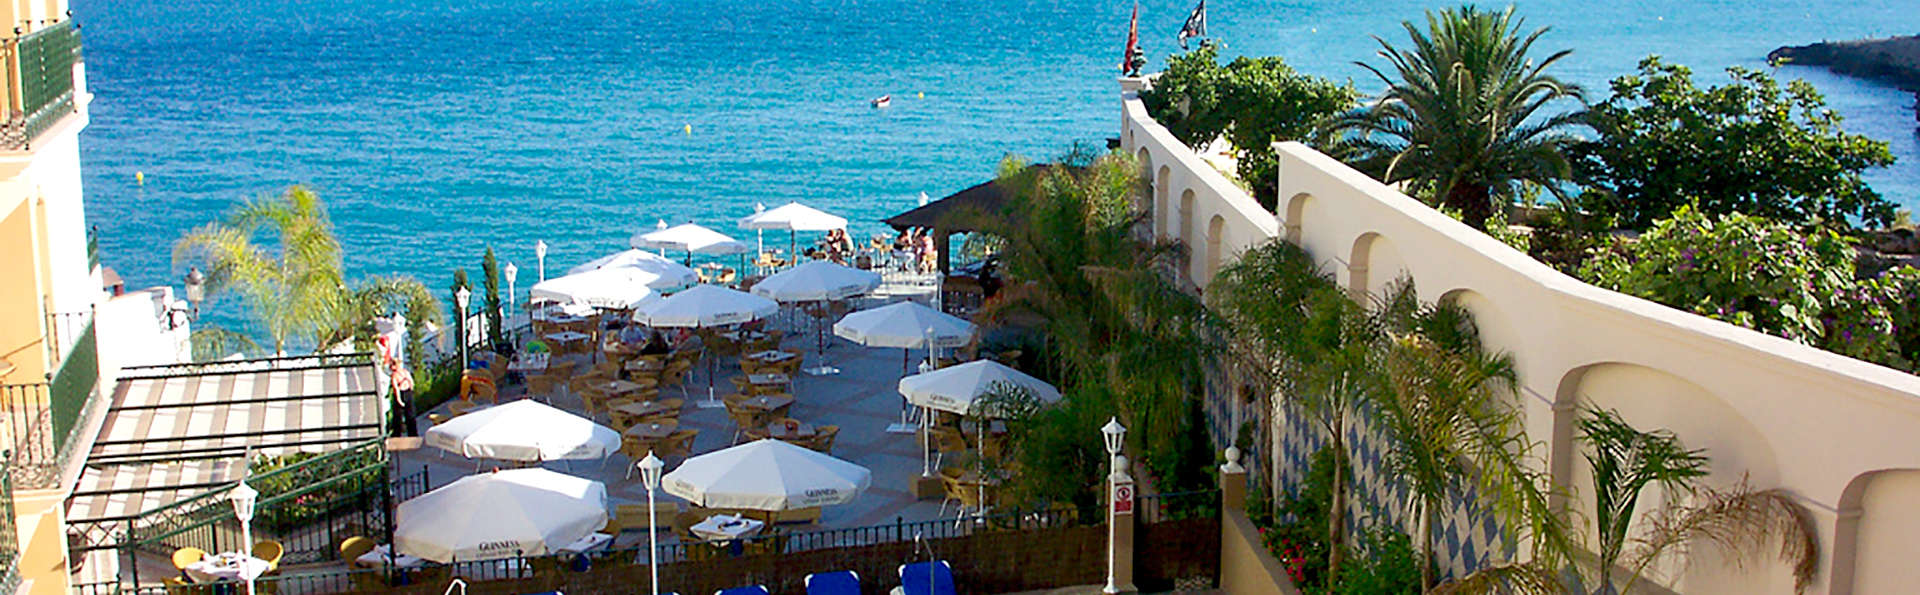 Hotel Toboso Apar-Turis - Edit_view.jpg